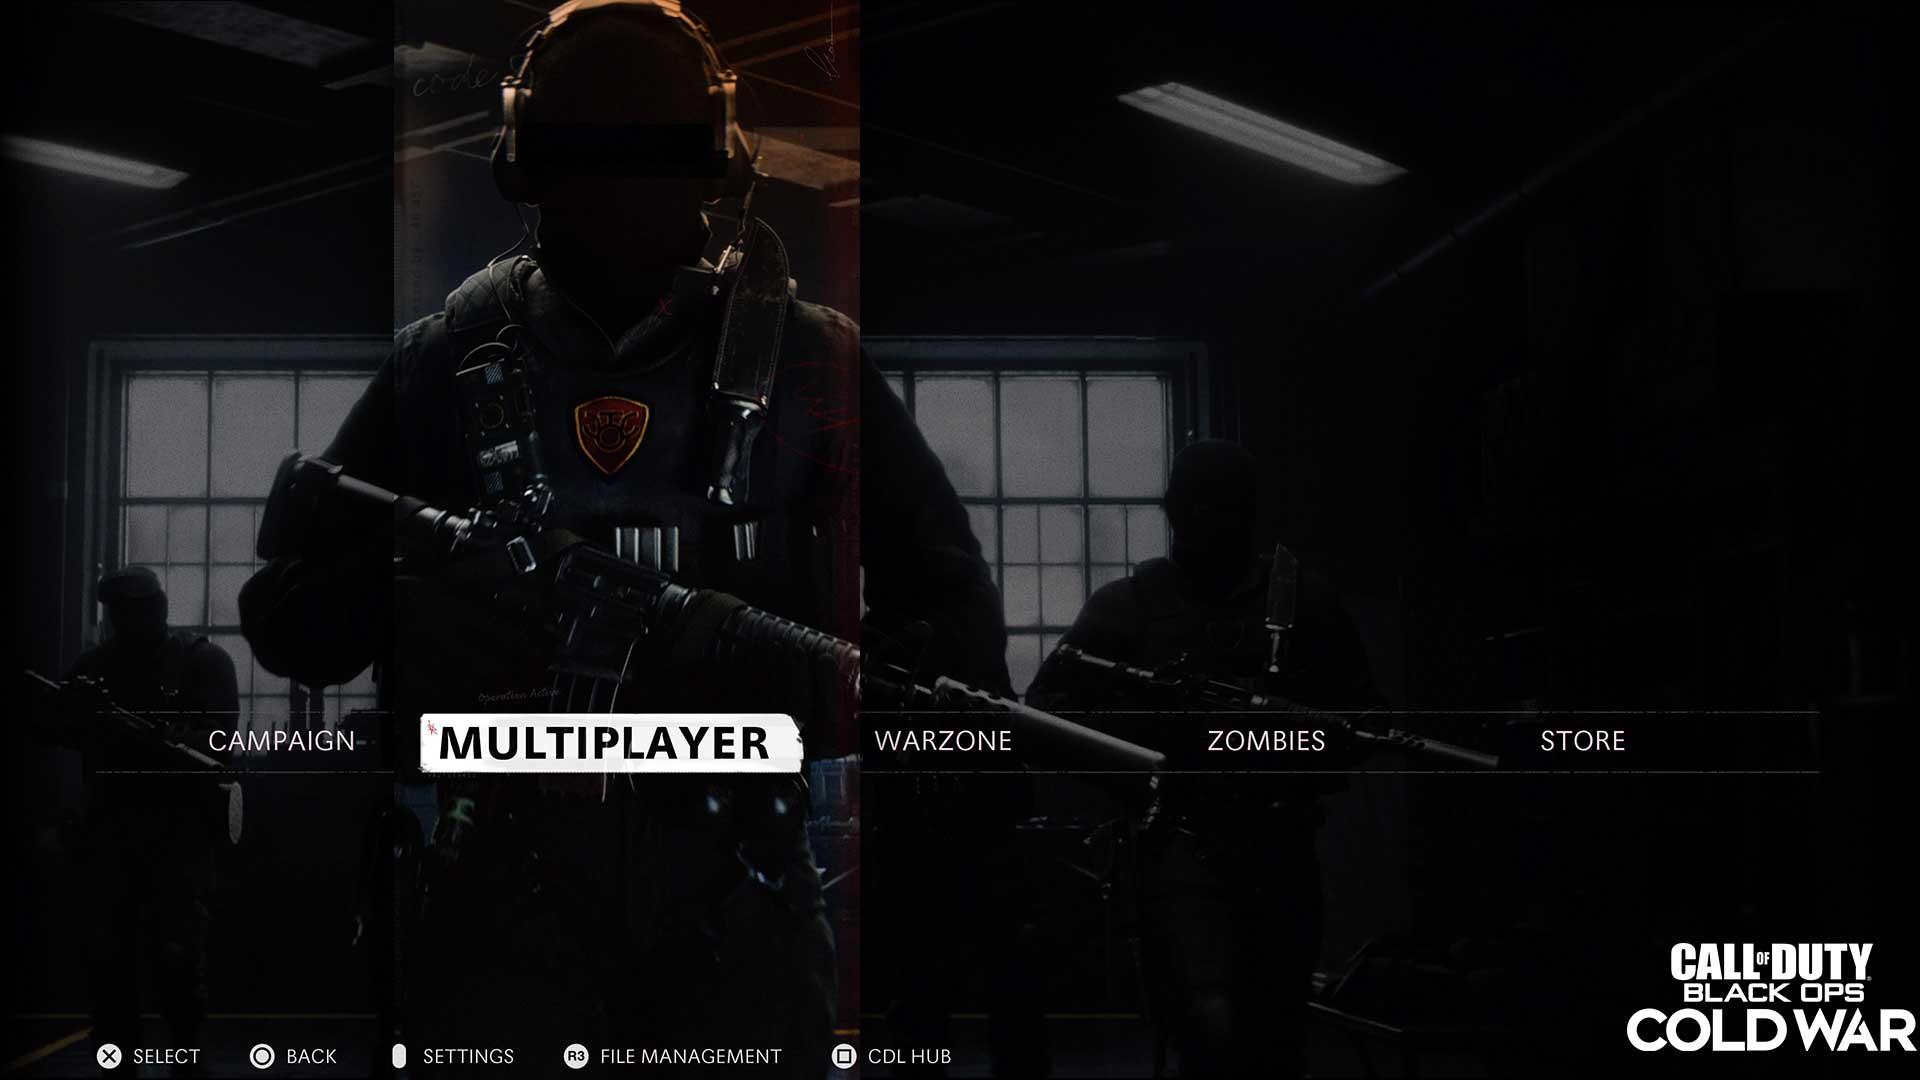 Guía de ascenso de rango multijugador de Black Ops Cold War